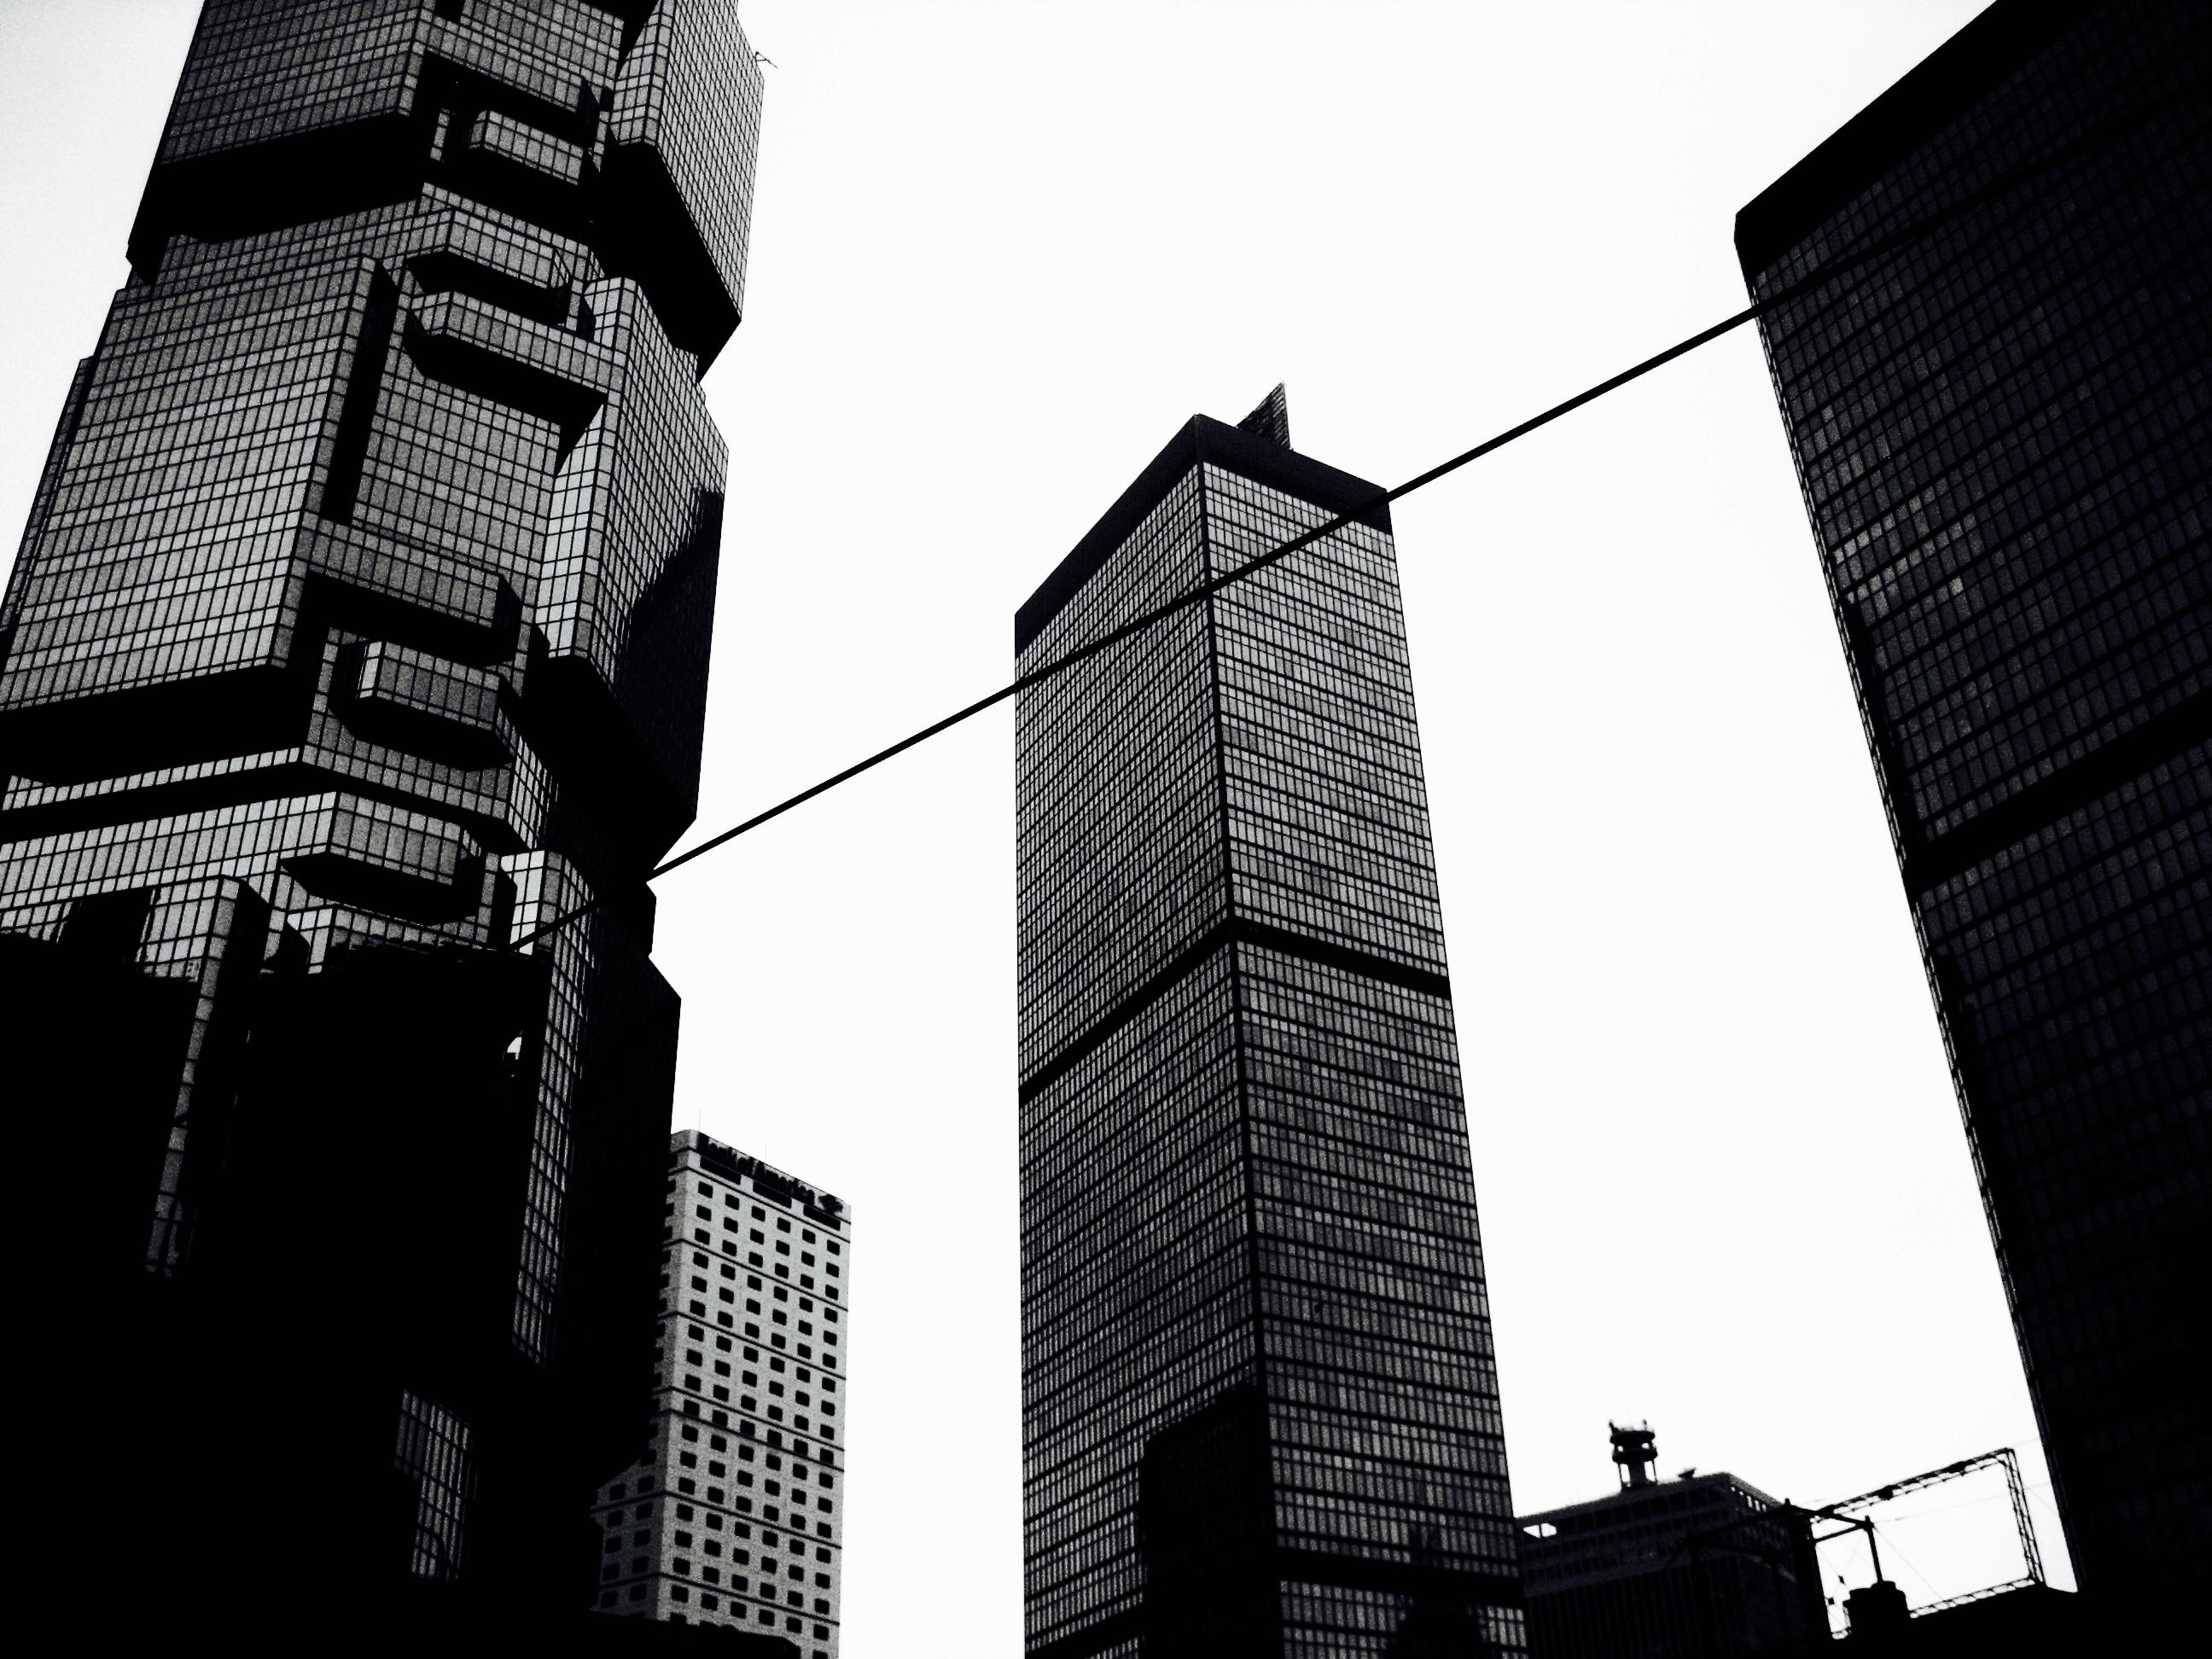 HONGKONG 01:07